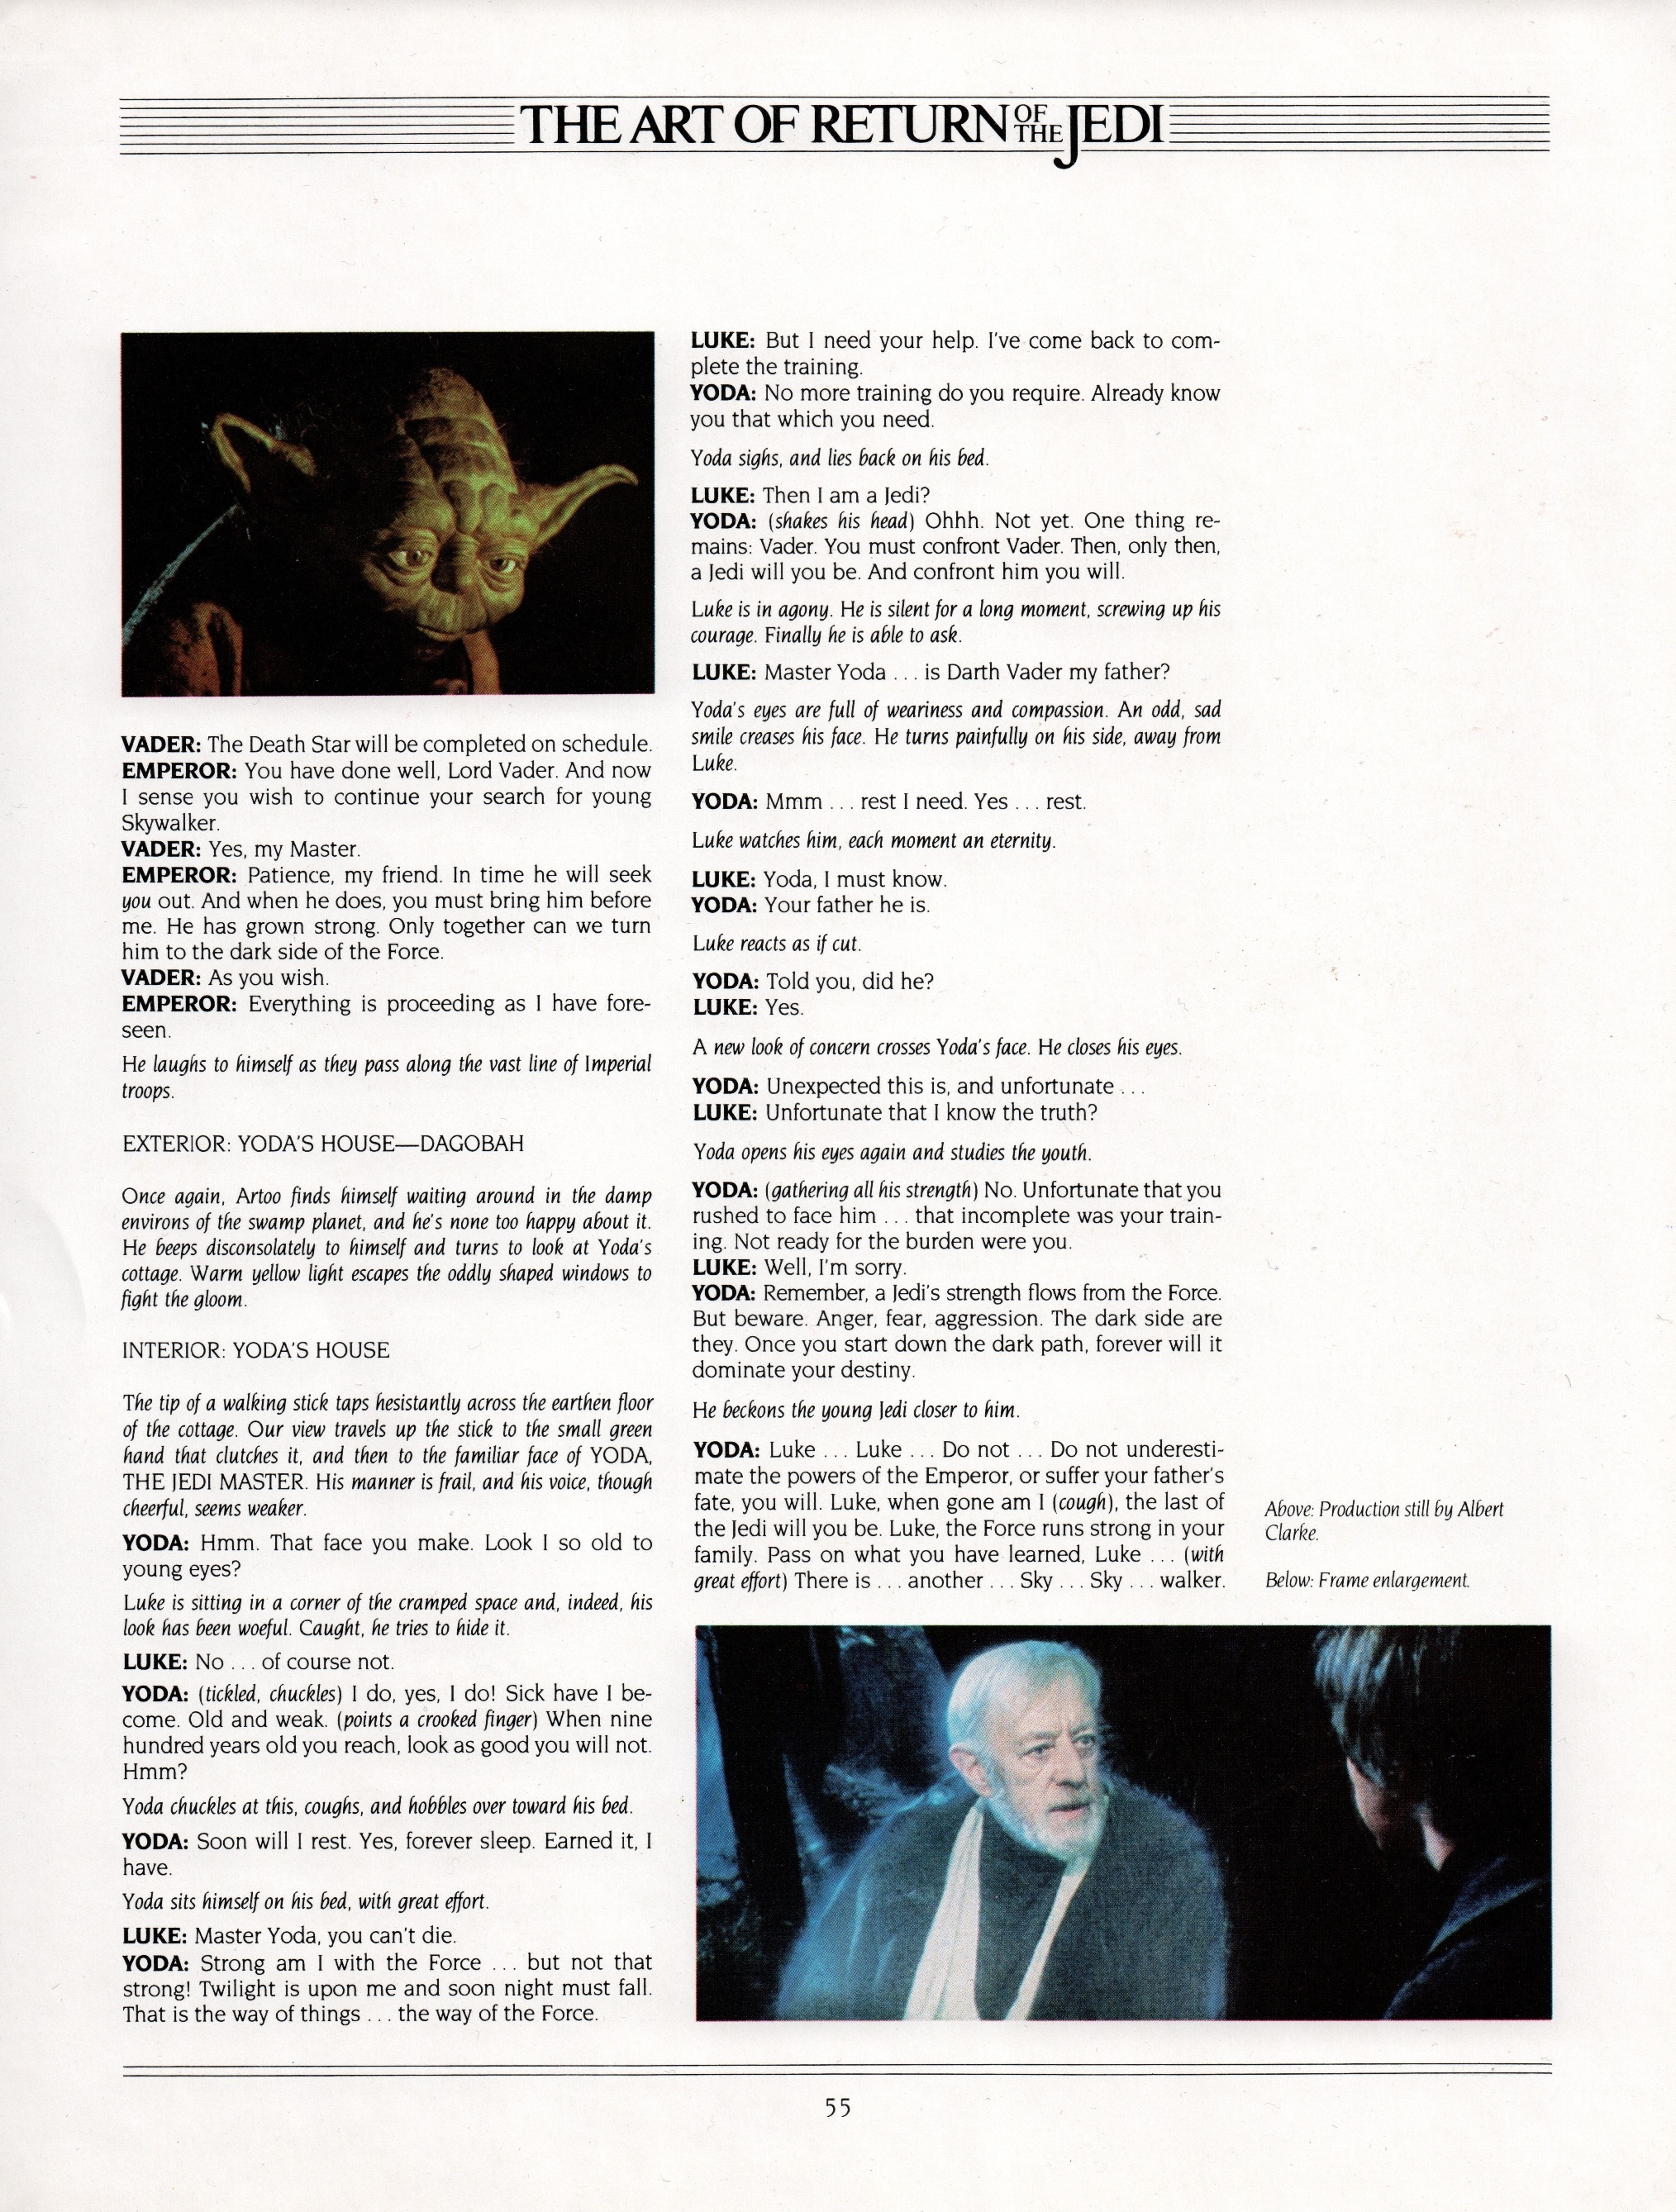 Art of Return of the Jedi (b0bafett_Empire)-p055